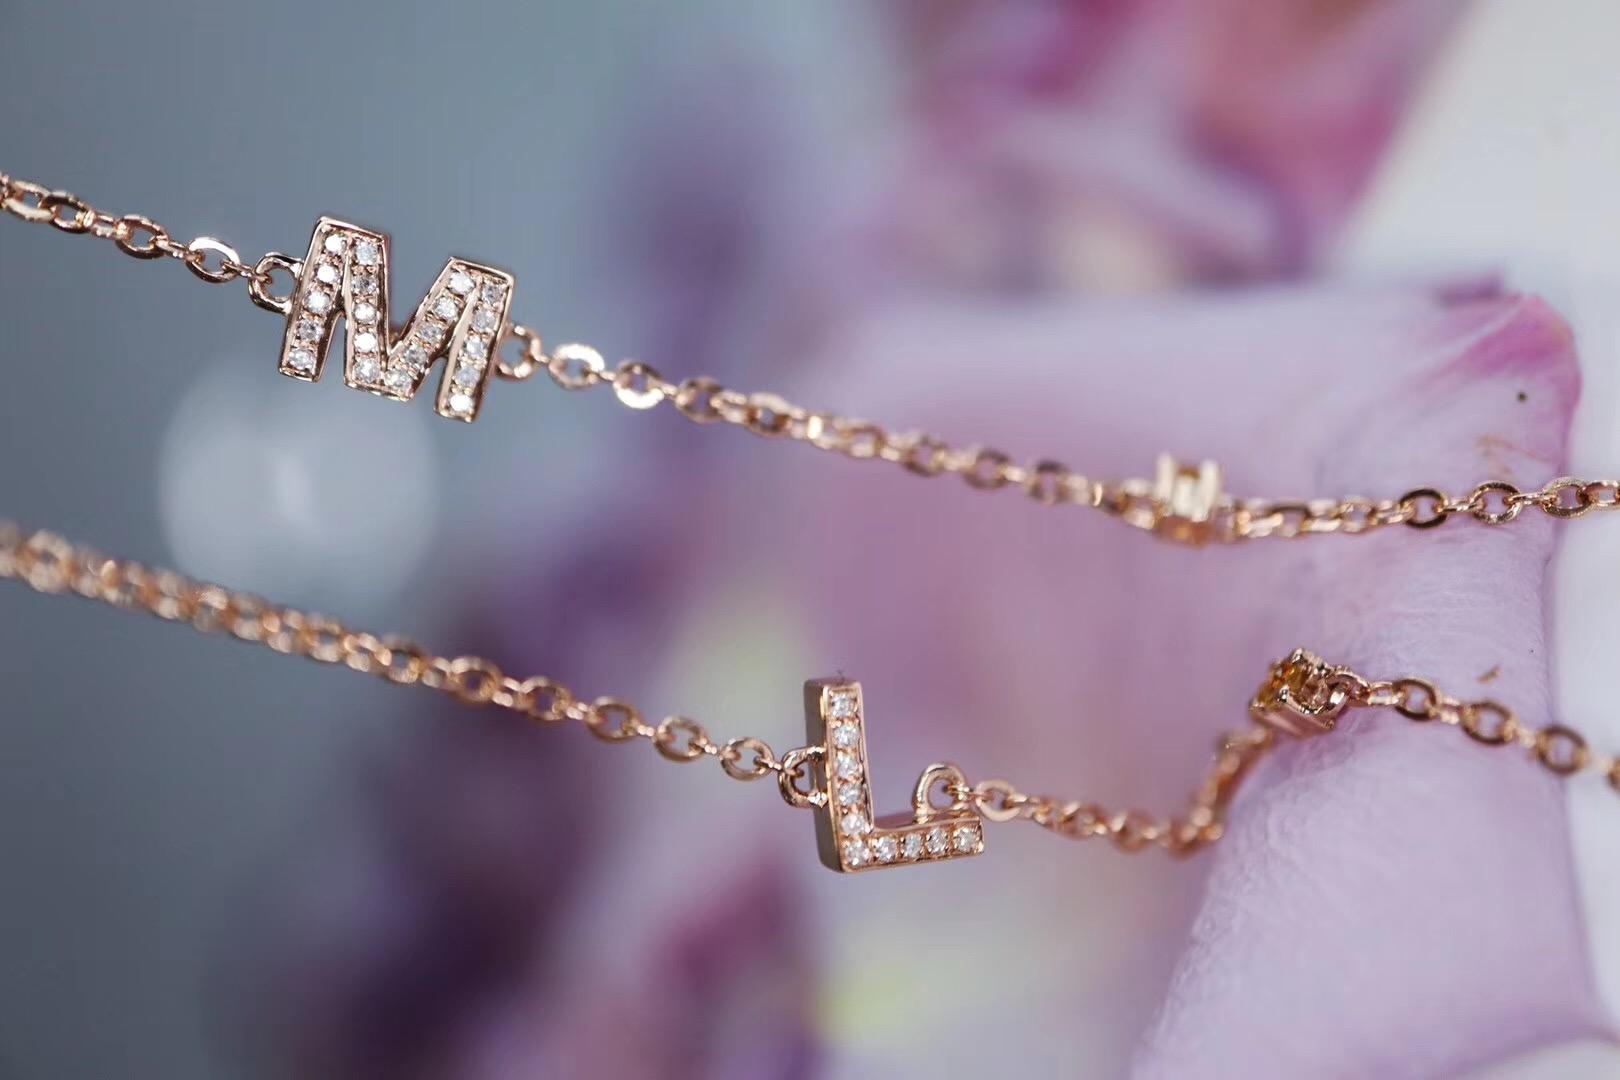 【18k金字母链&碧玺颜色可选】真是每个小仙女必备-菩心晶舍